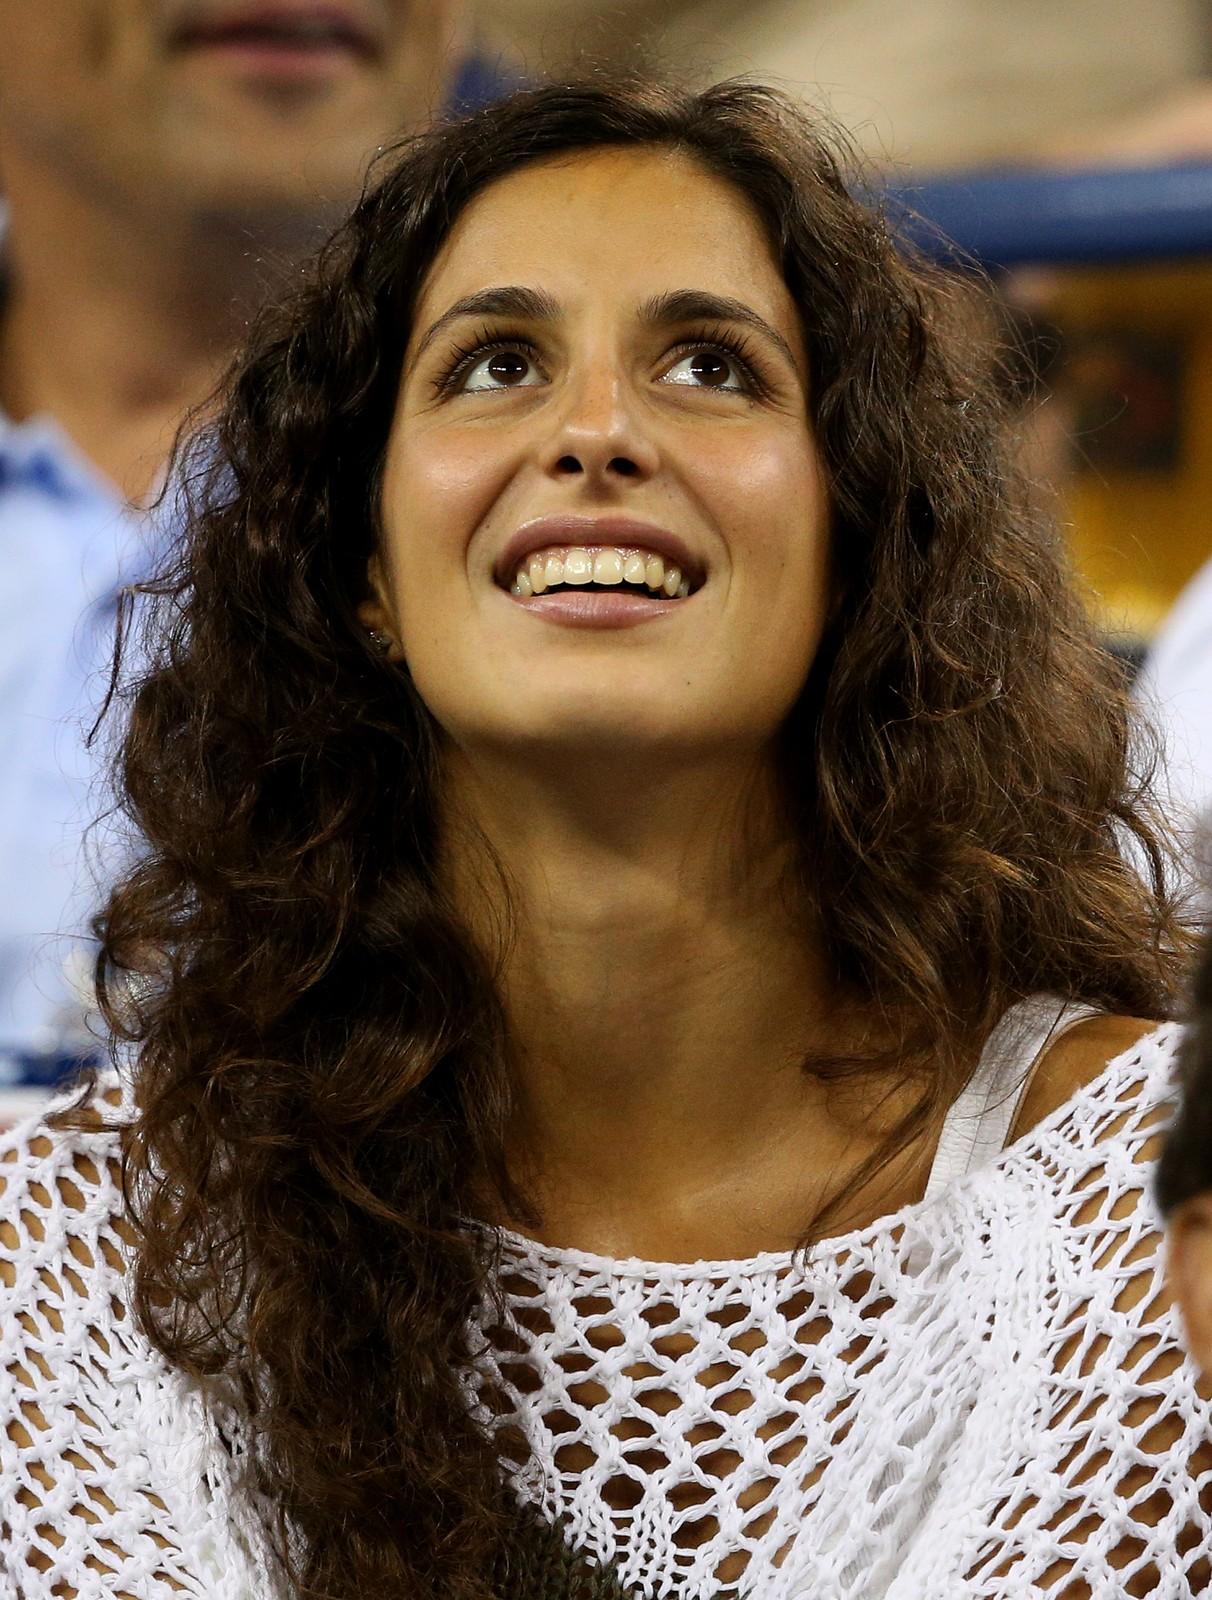 Cice koje su osvojile srca poznatih tenisera Rafael-nadal-fans-us-open-2013-32